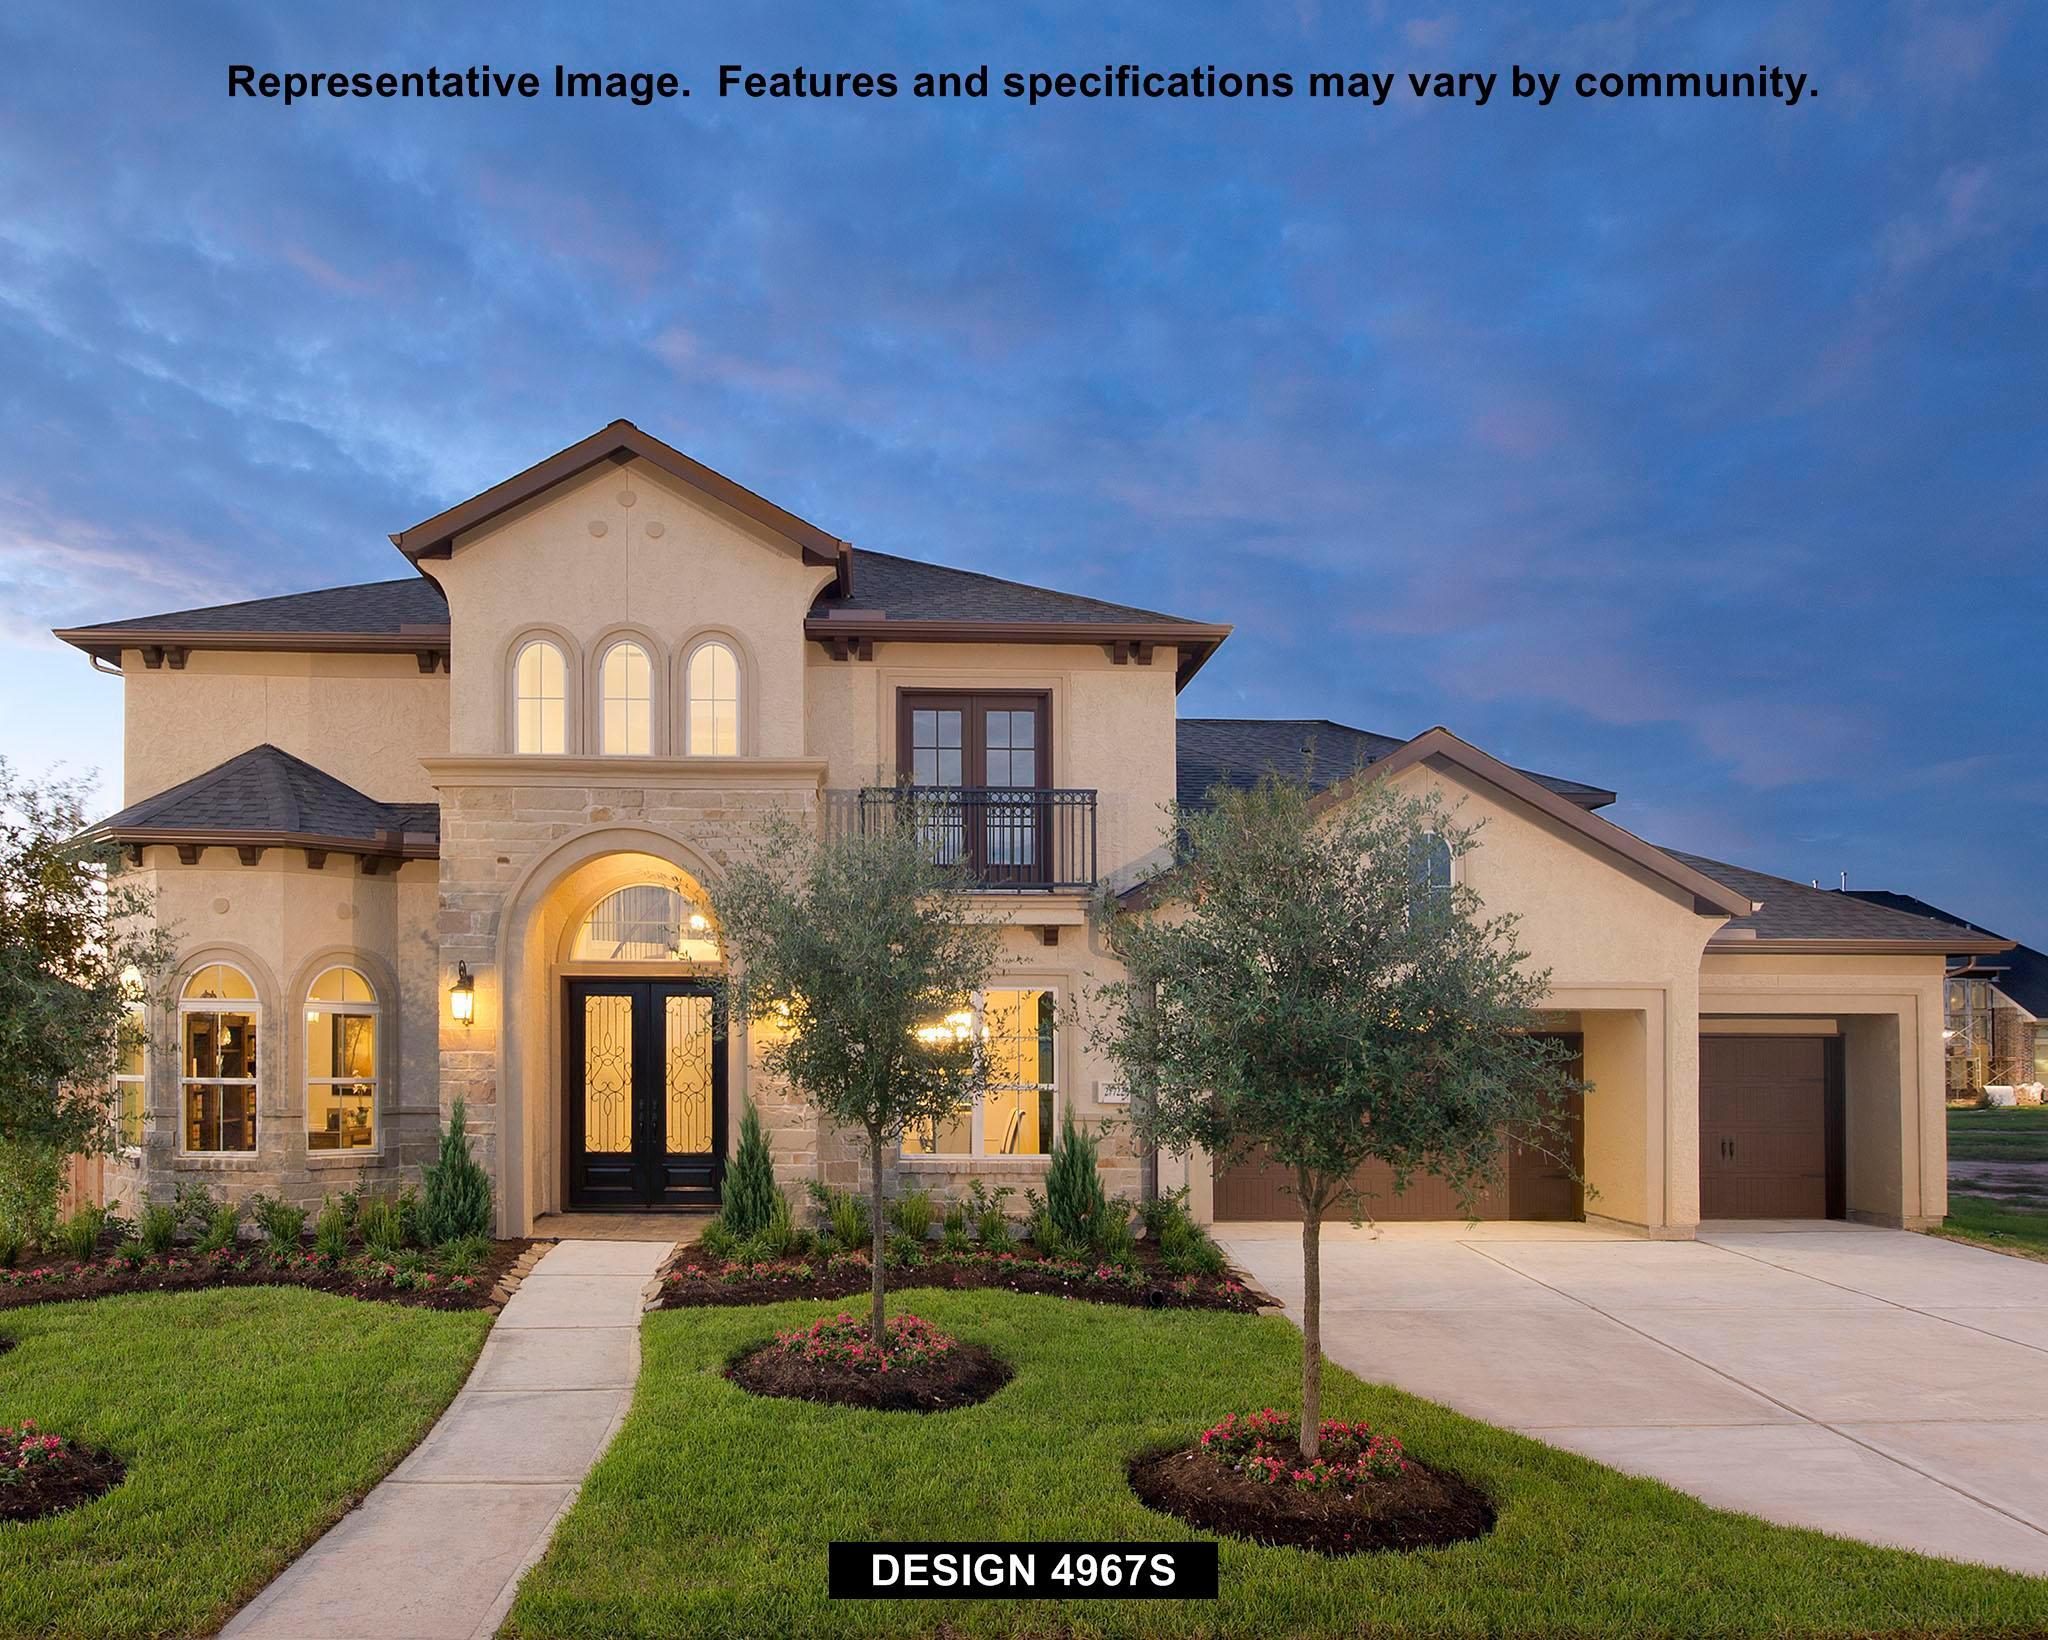 Single Family for Sale at Balcones Creek Half Acre - 4967s 7986 Cibolo View Fair Oaks Ranch, Texas 78015 United States